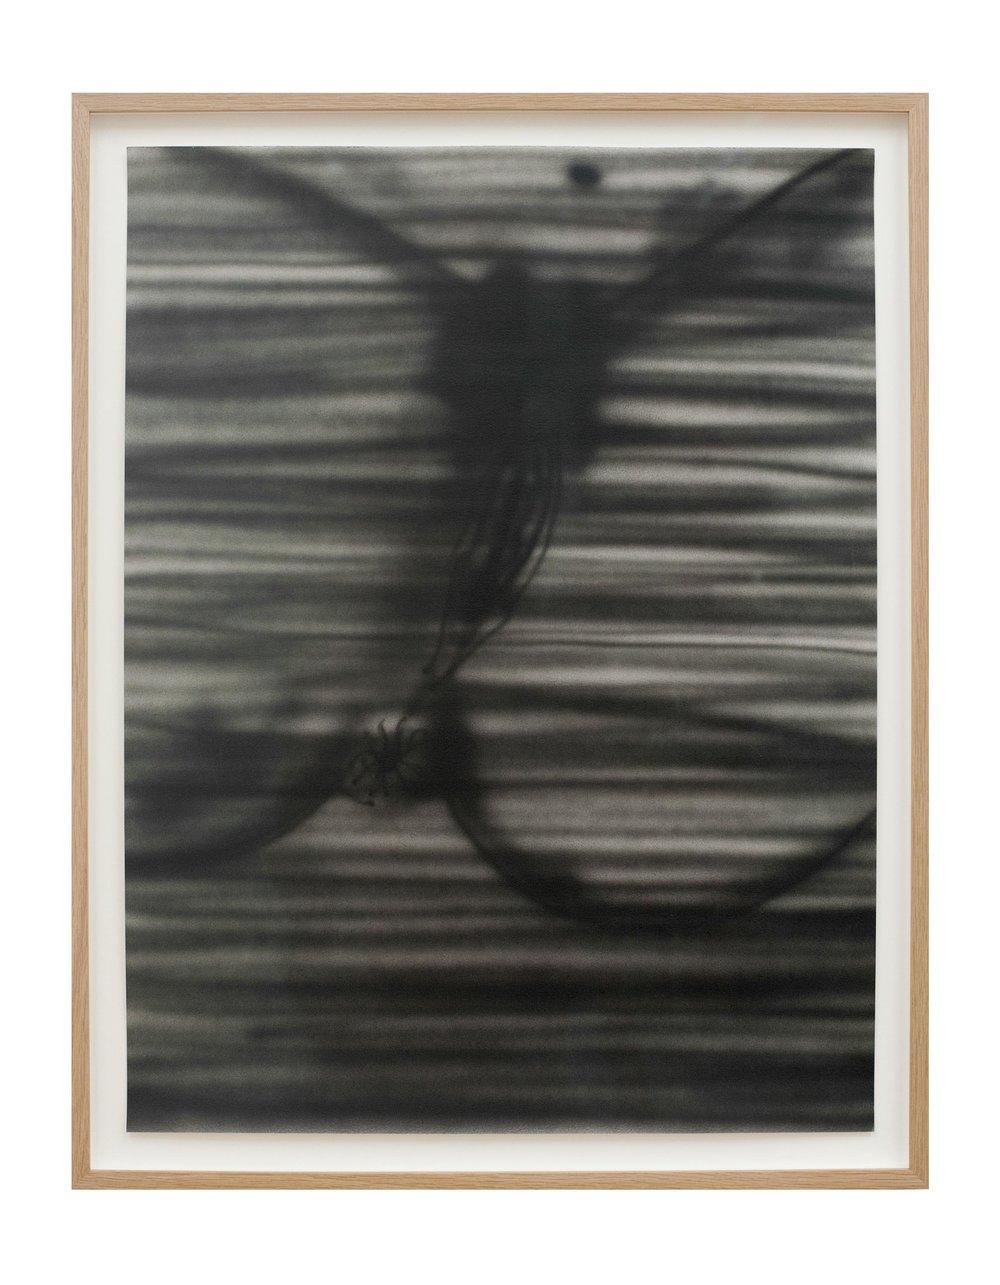 "Alex Becerra My Dad Said ""Eat the Sandwichon"" 2016 Acrylic airbrush on paper (framed) 23 2/3 x 17 7/10 in (59.18h x 44.96w cm) AB027"